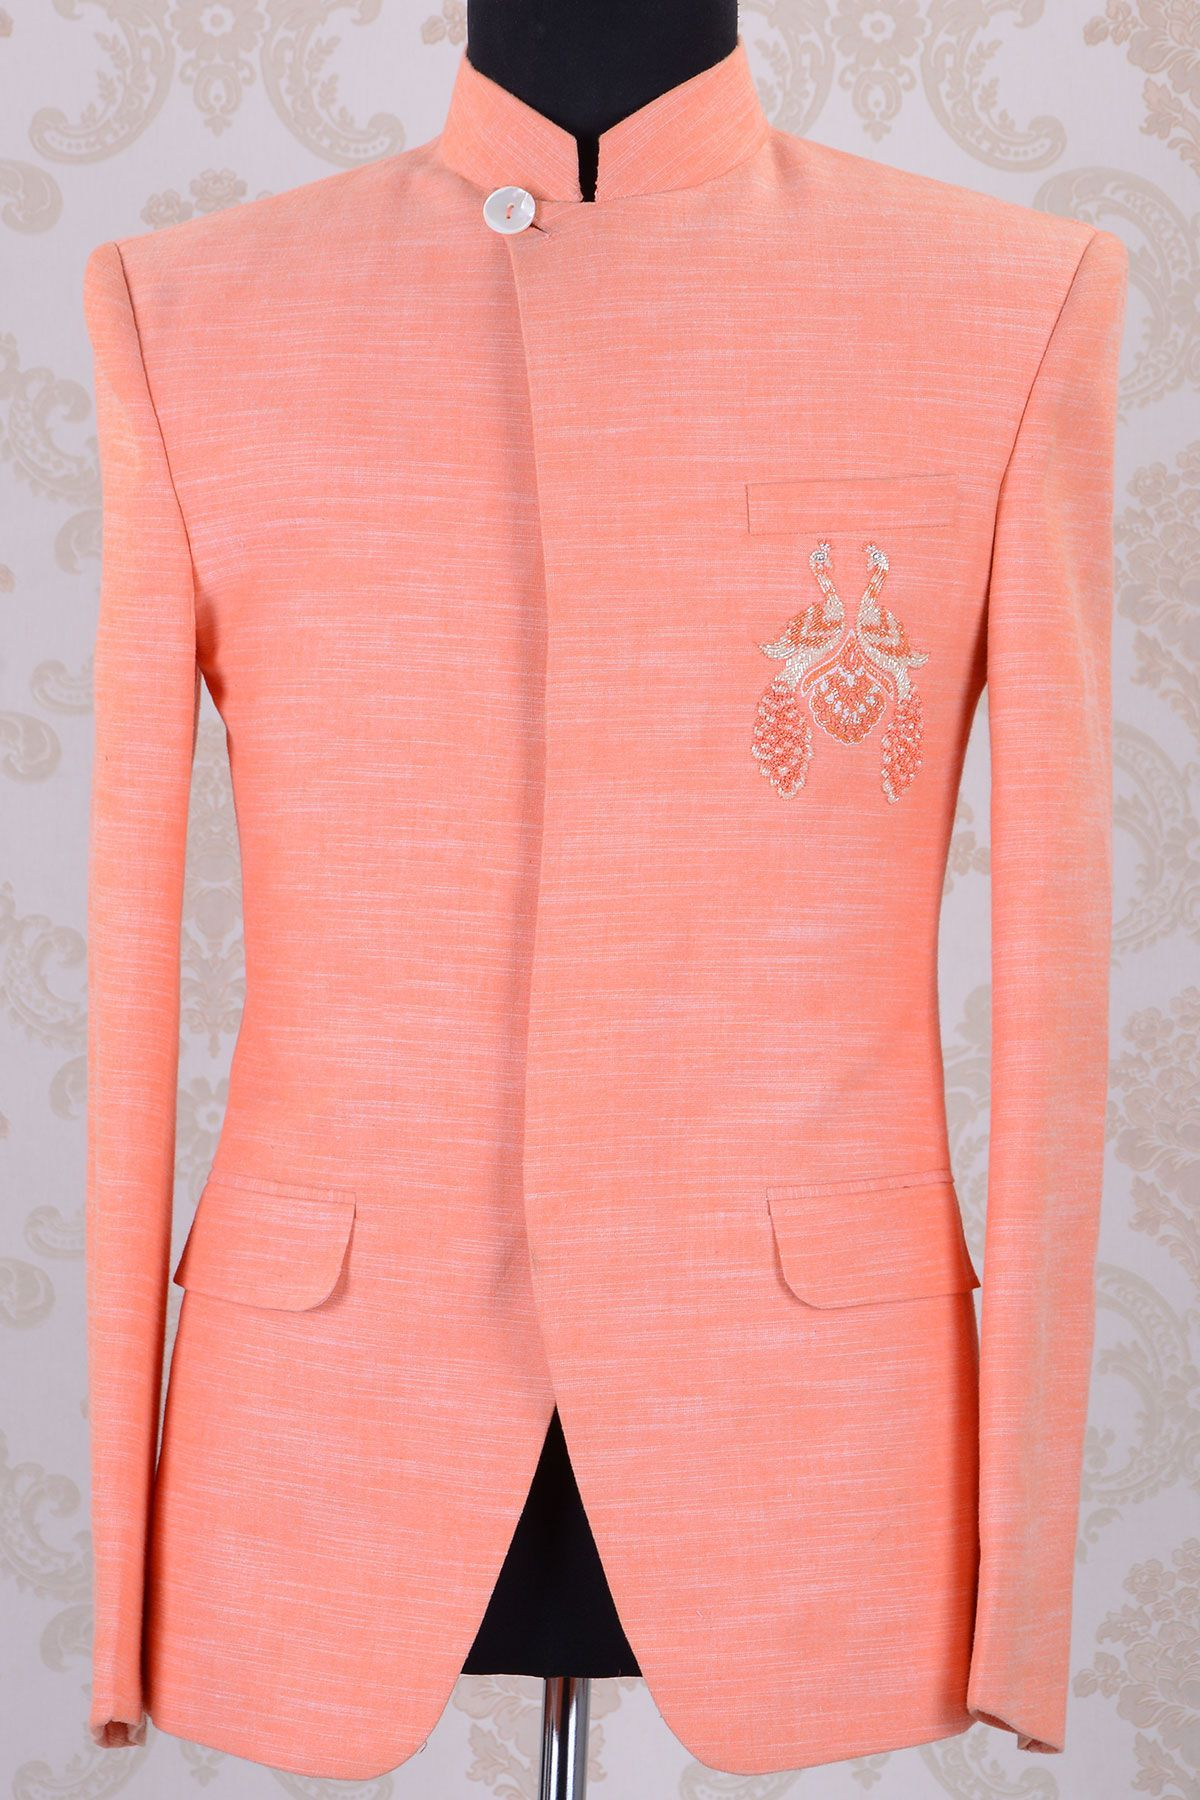 Jodhpuri Suits-Peach-Bead Work-ST625 | Túnicas y Moda masculina